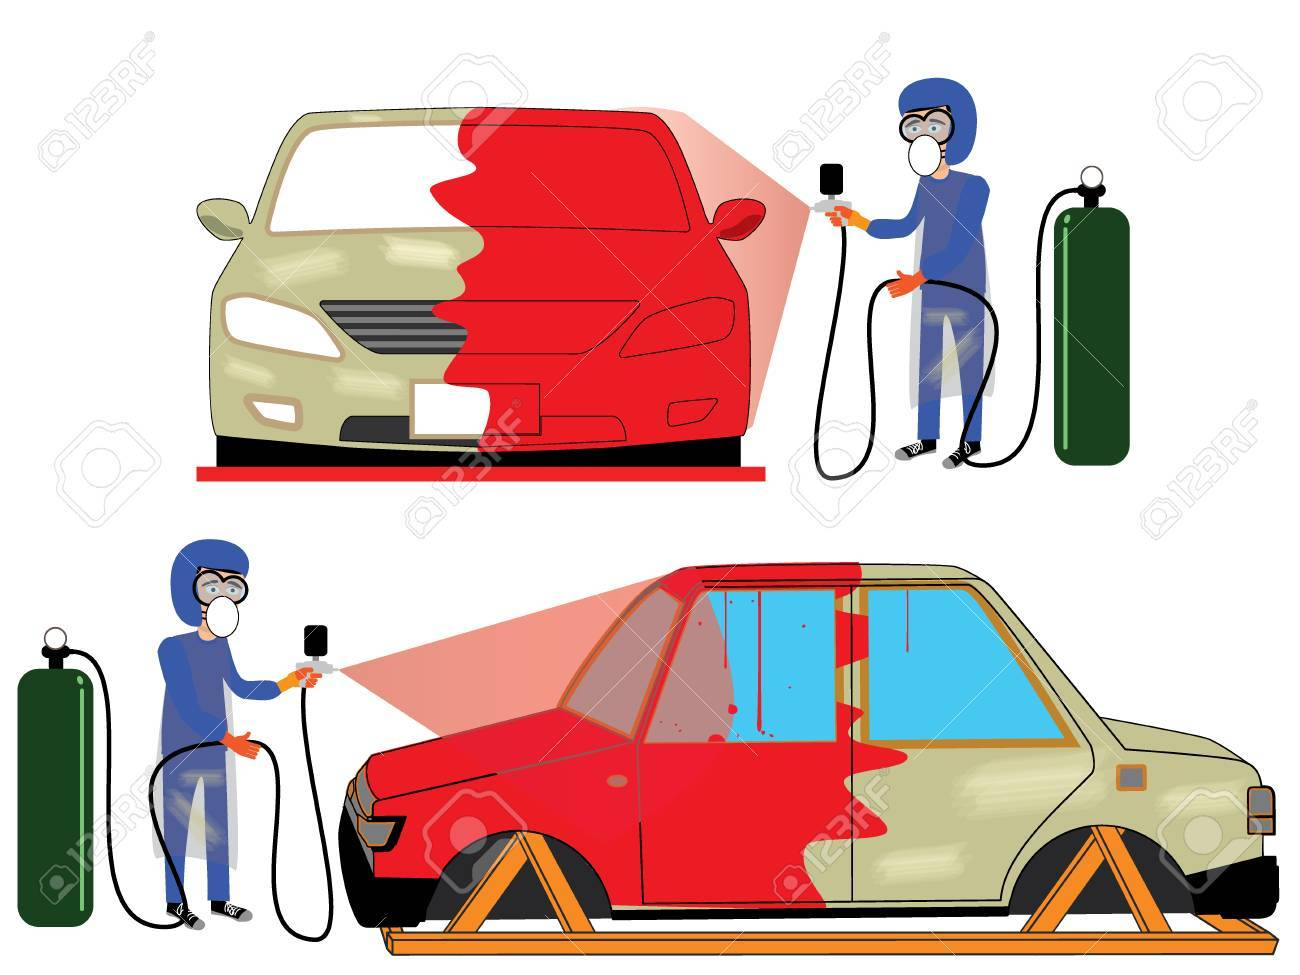 spray painting auto mobile body at car collision repair shop rh 123rf com Auto Repair Humor A and B Auto Repair